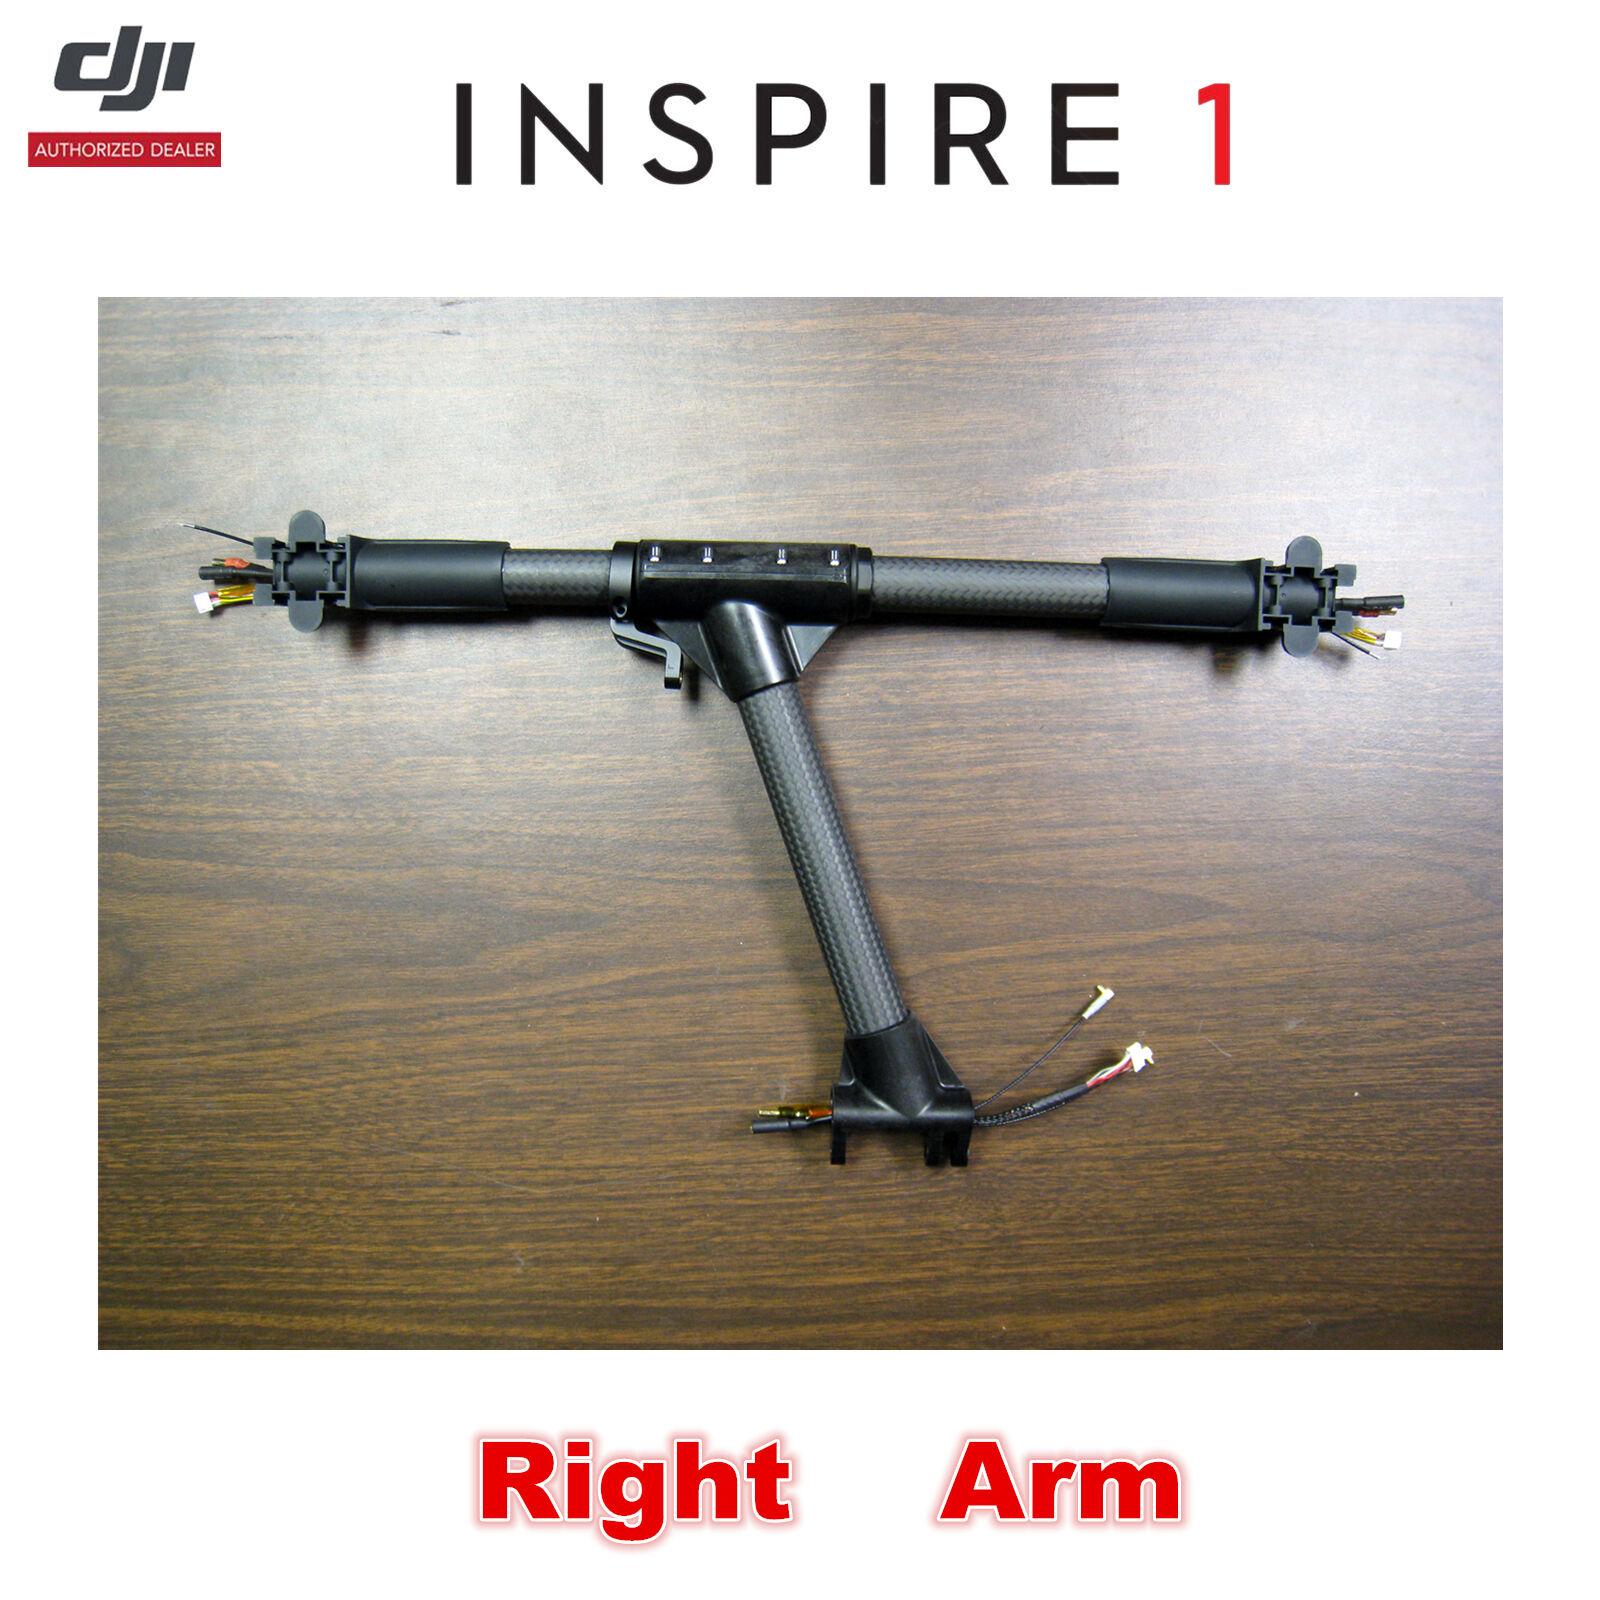 dji inspire 1 v1 v2 0 drone right arm assembly ebay